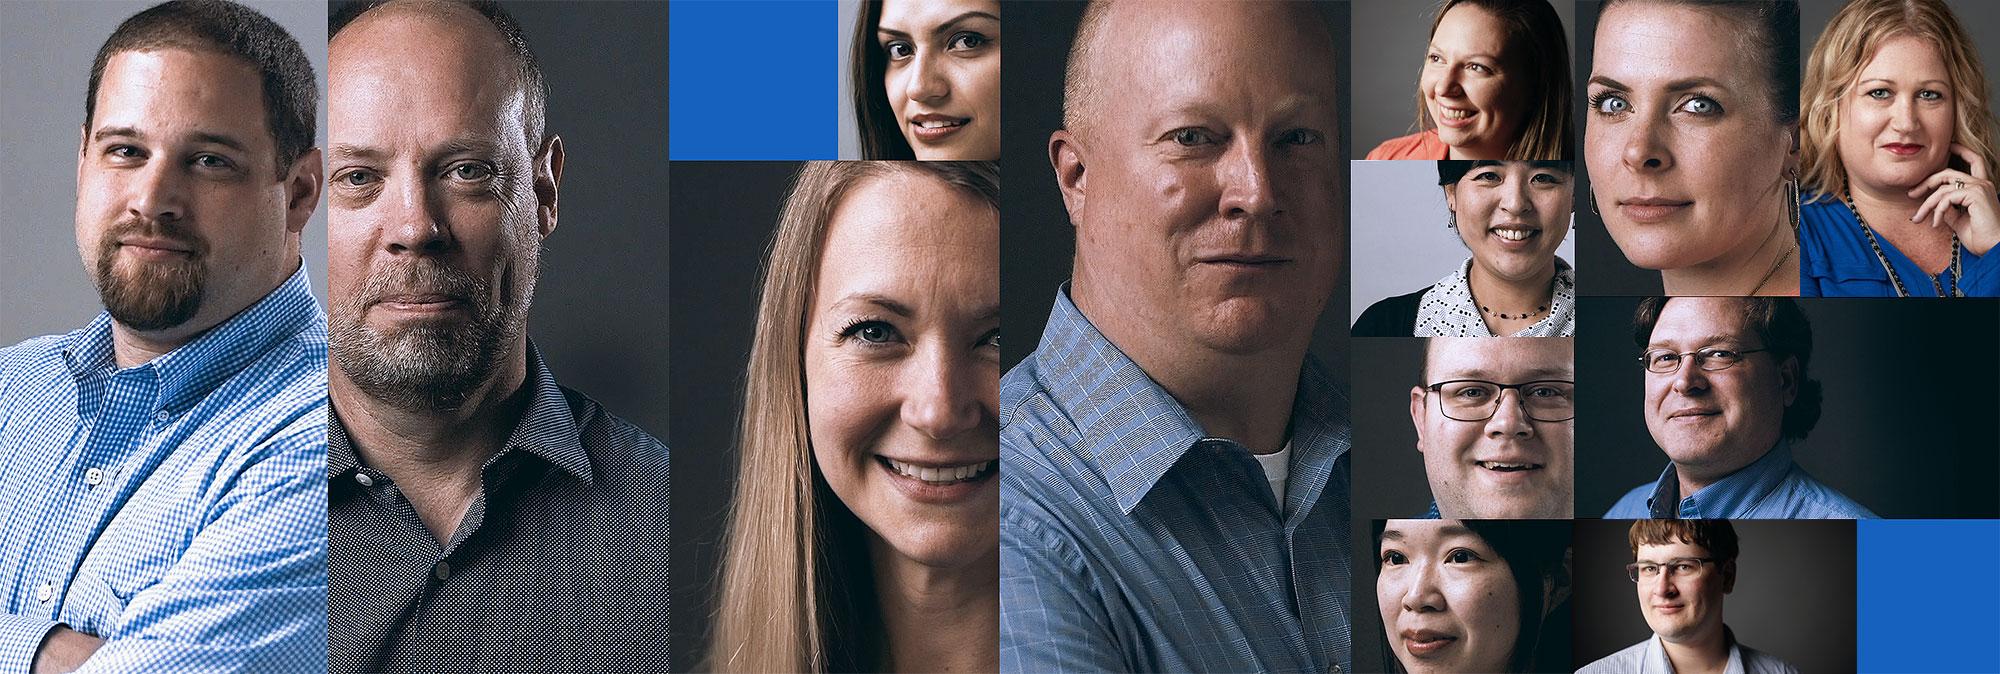 DPW Business Services - Oregon. Doty Pruett Wilson, PC